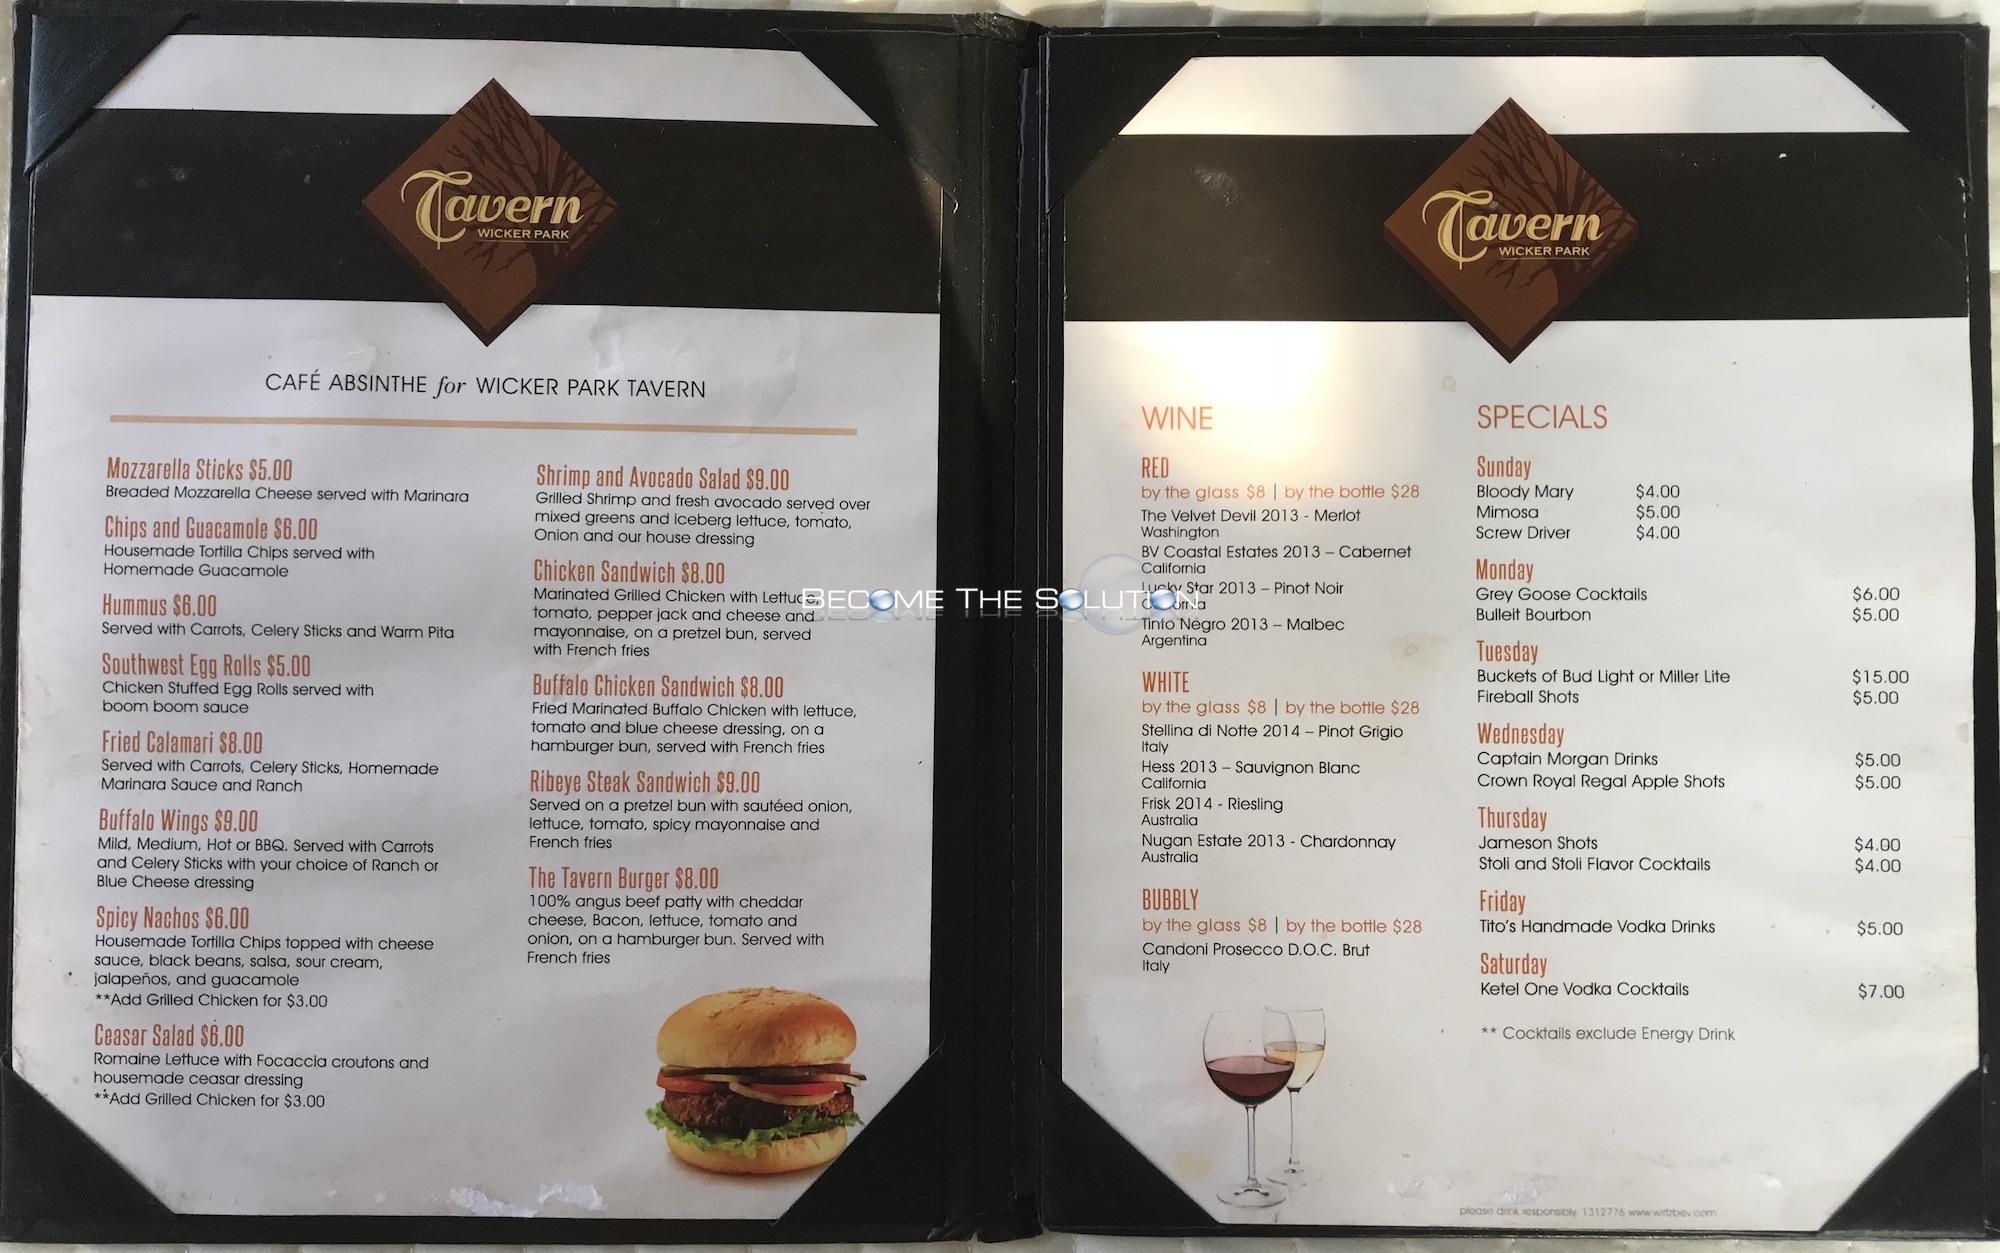 tavern wicker park menu 3